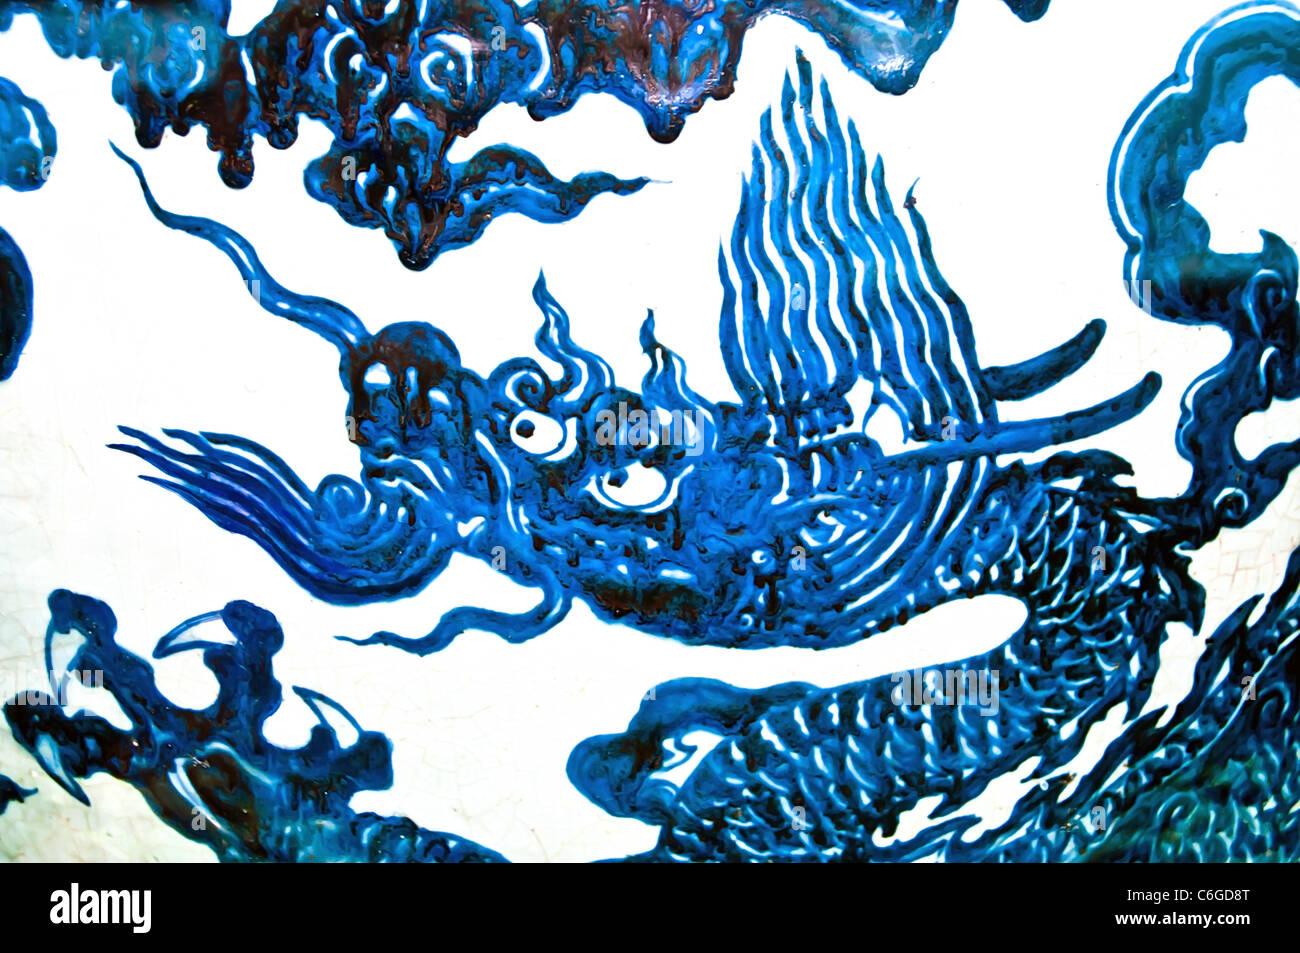 Ming vase stock photos ming vase stock images alamy blue chinese dragon on white background decoration of a ming vase stock image reviewsmspy